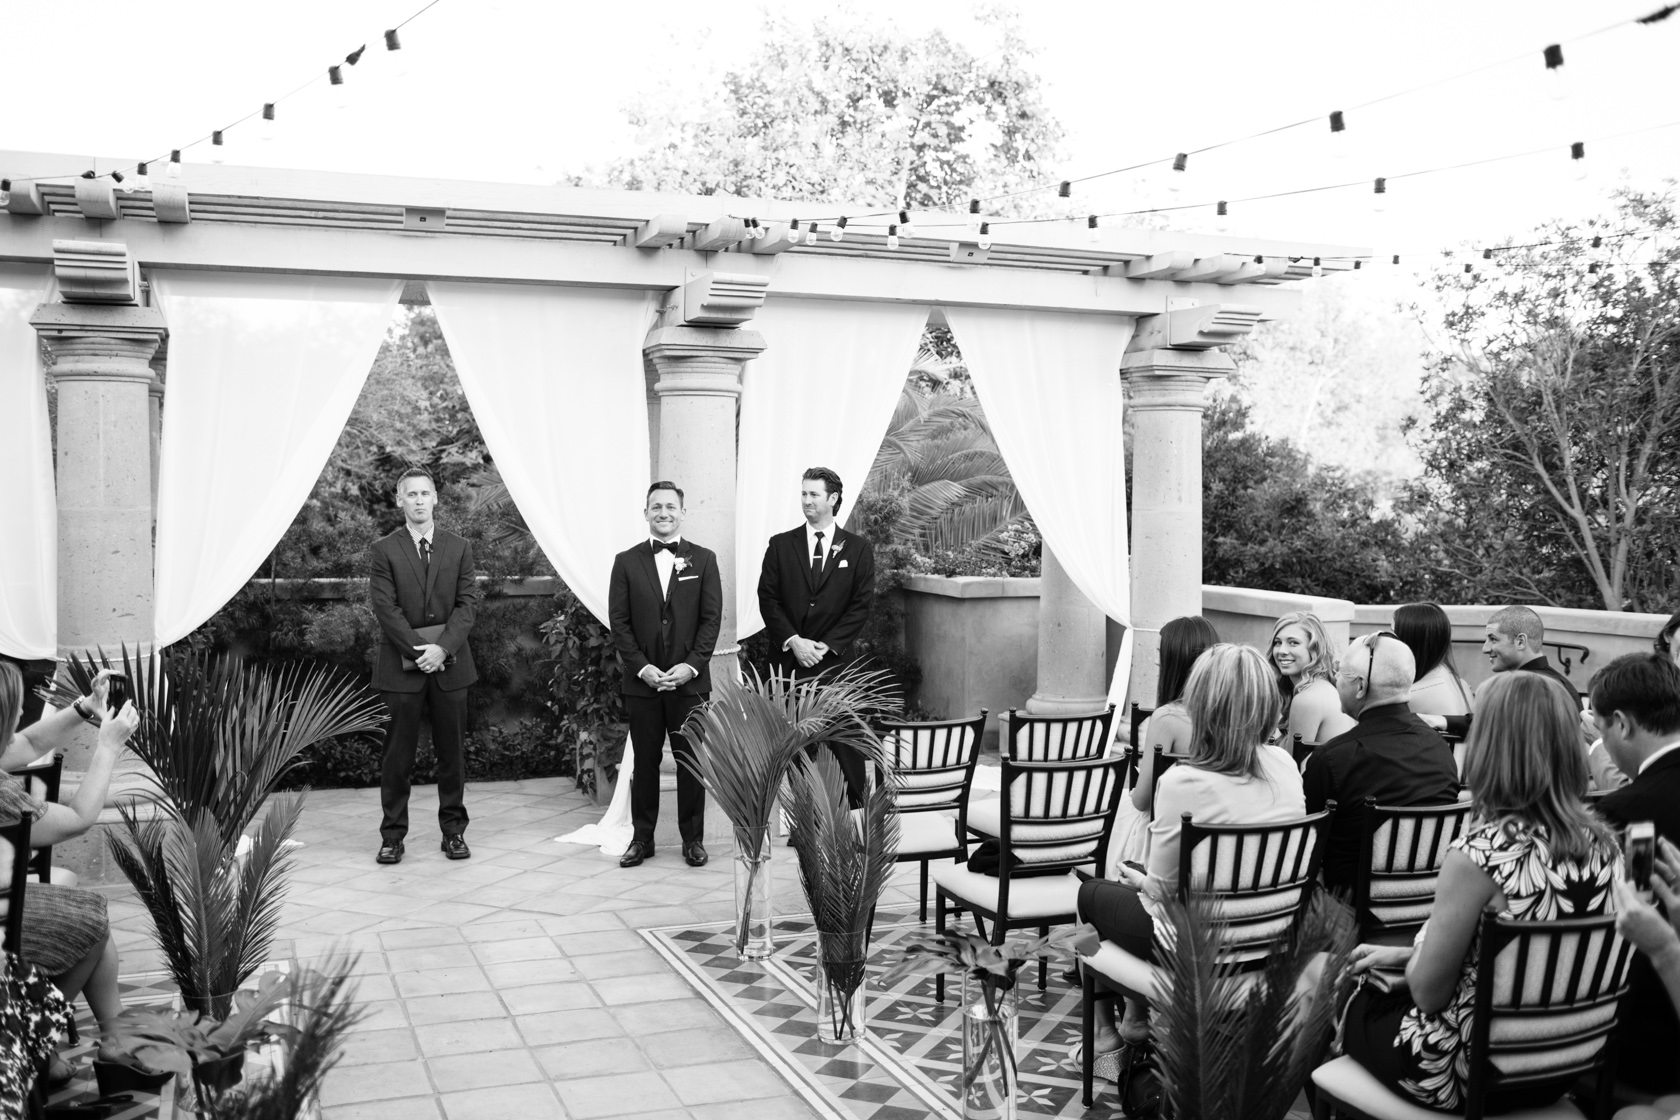 Rancho_Valencia_Resort_Wedding_063.jpg